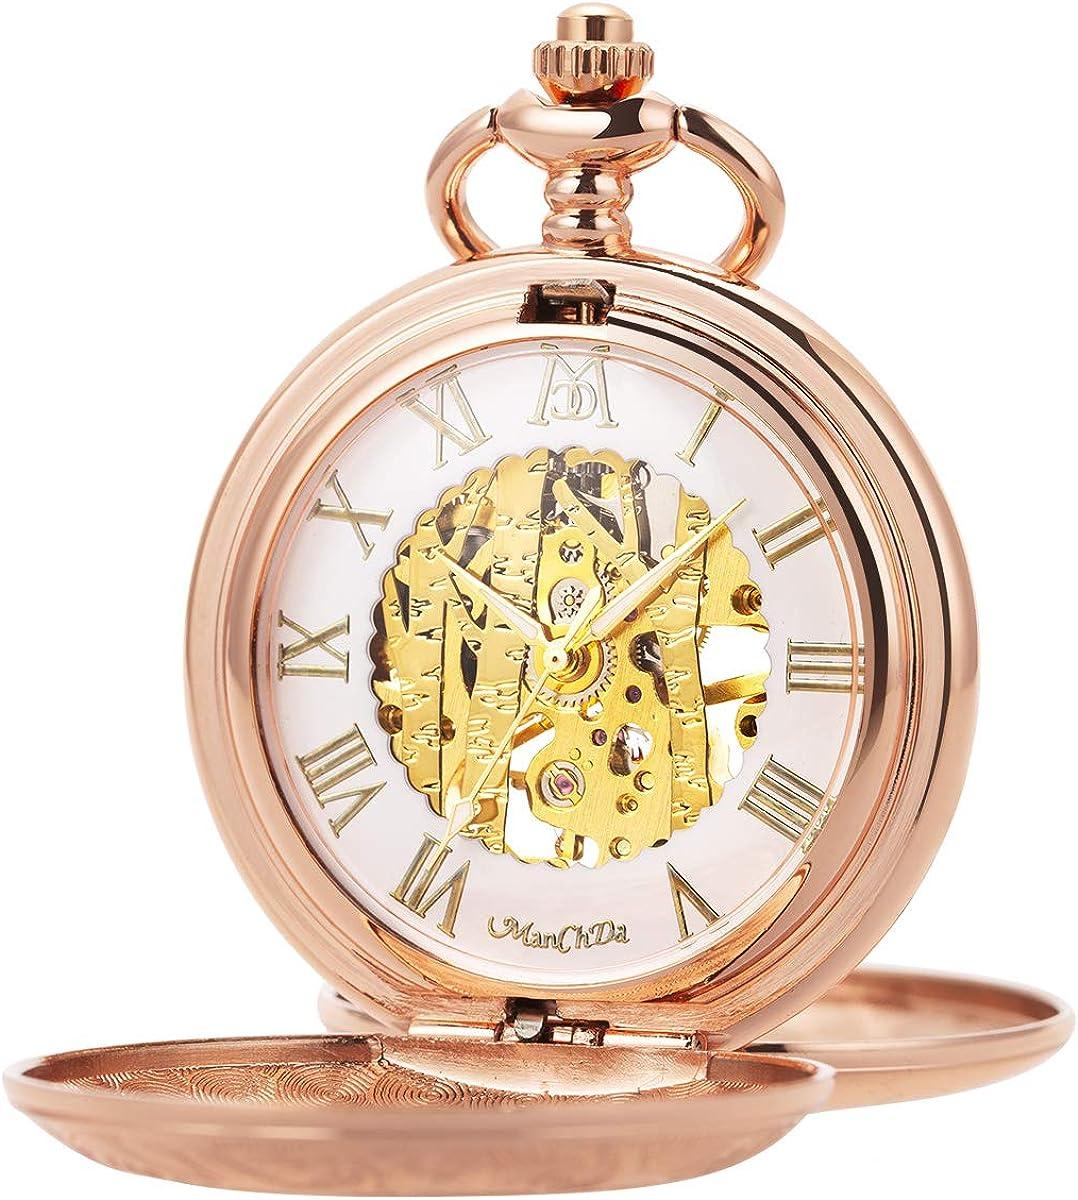 Reloj de Bolsillo - Rosa Rosada Dorado ManChDa Grabado Caso Doble Cazador Esqueleto Esfera Blanca Visible Movimiento mecánico con Cadena para Hombres Mujeres + Caja de Regalo: Amazon.es: Relojes